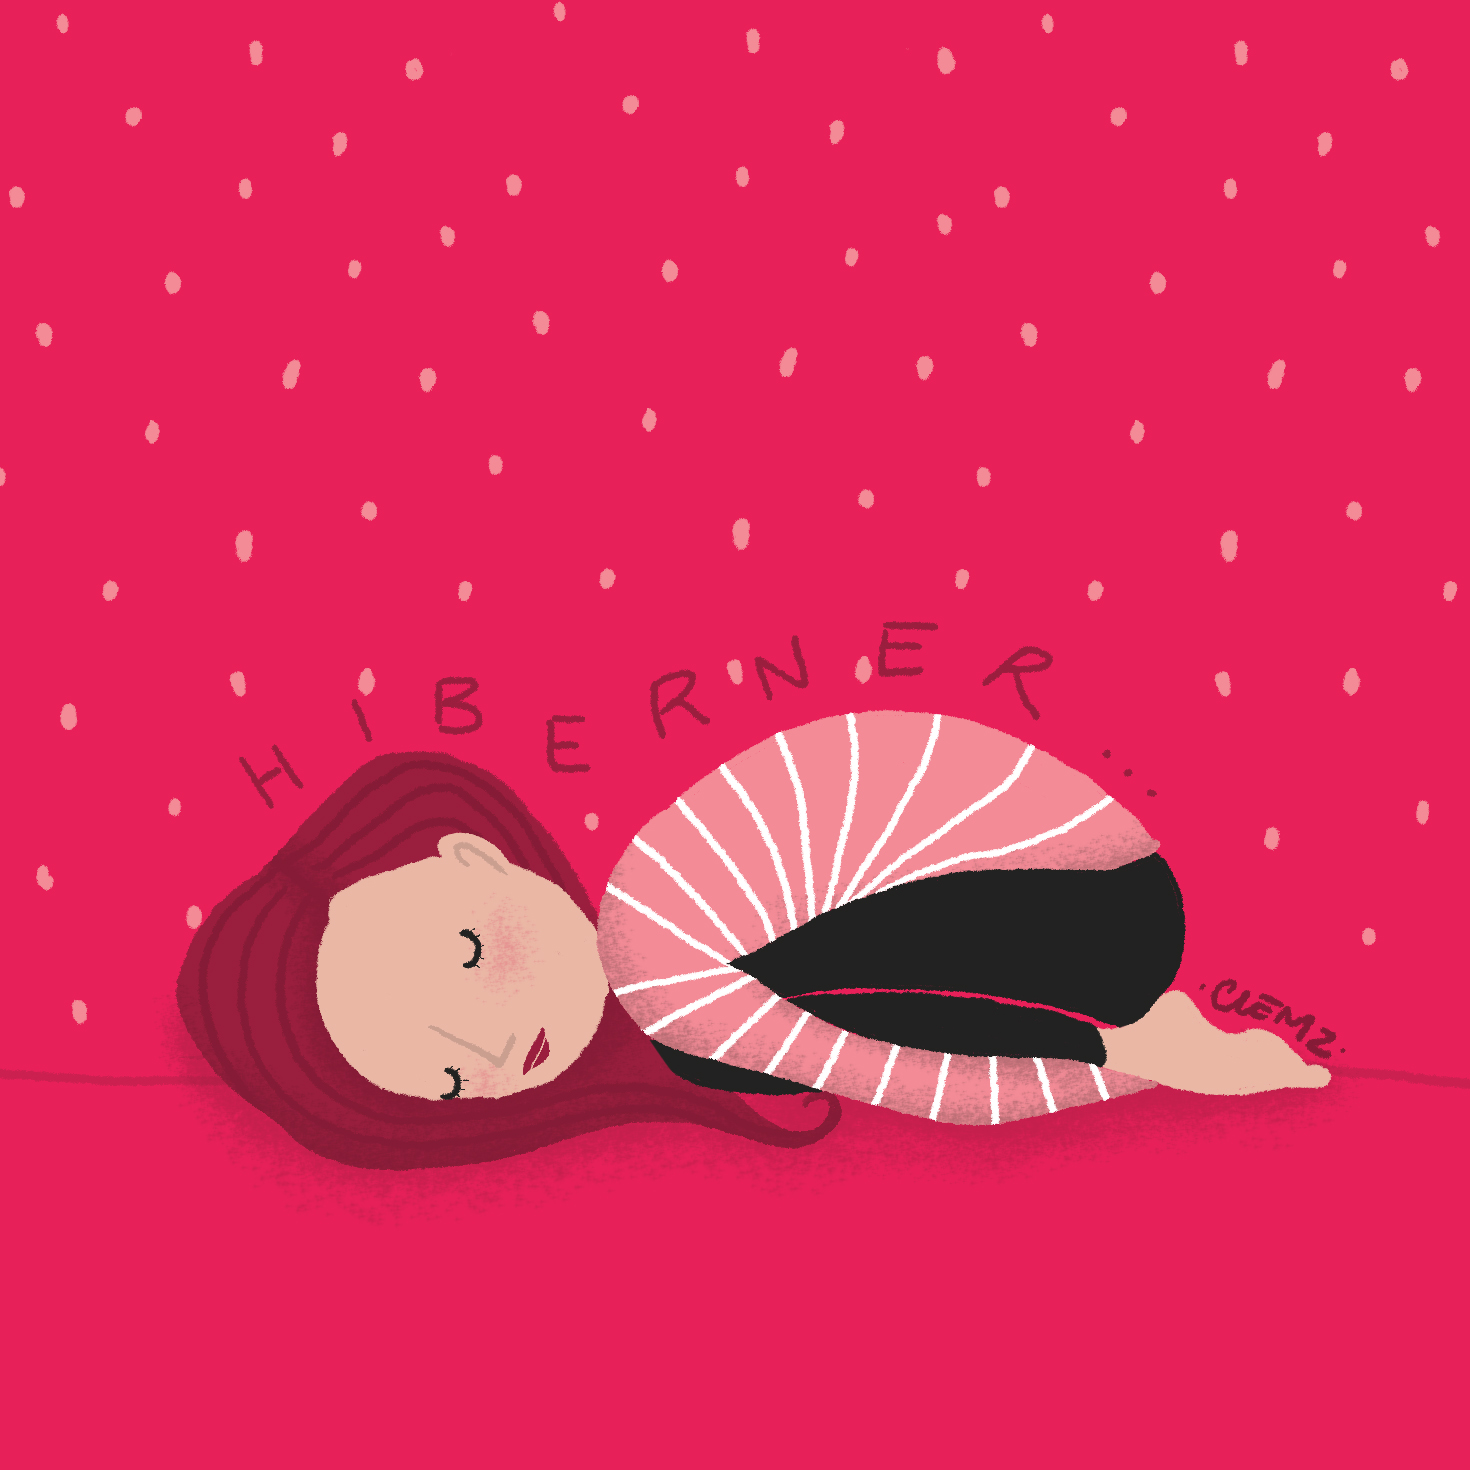 illustration hiberner - lyon - paris - france